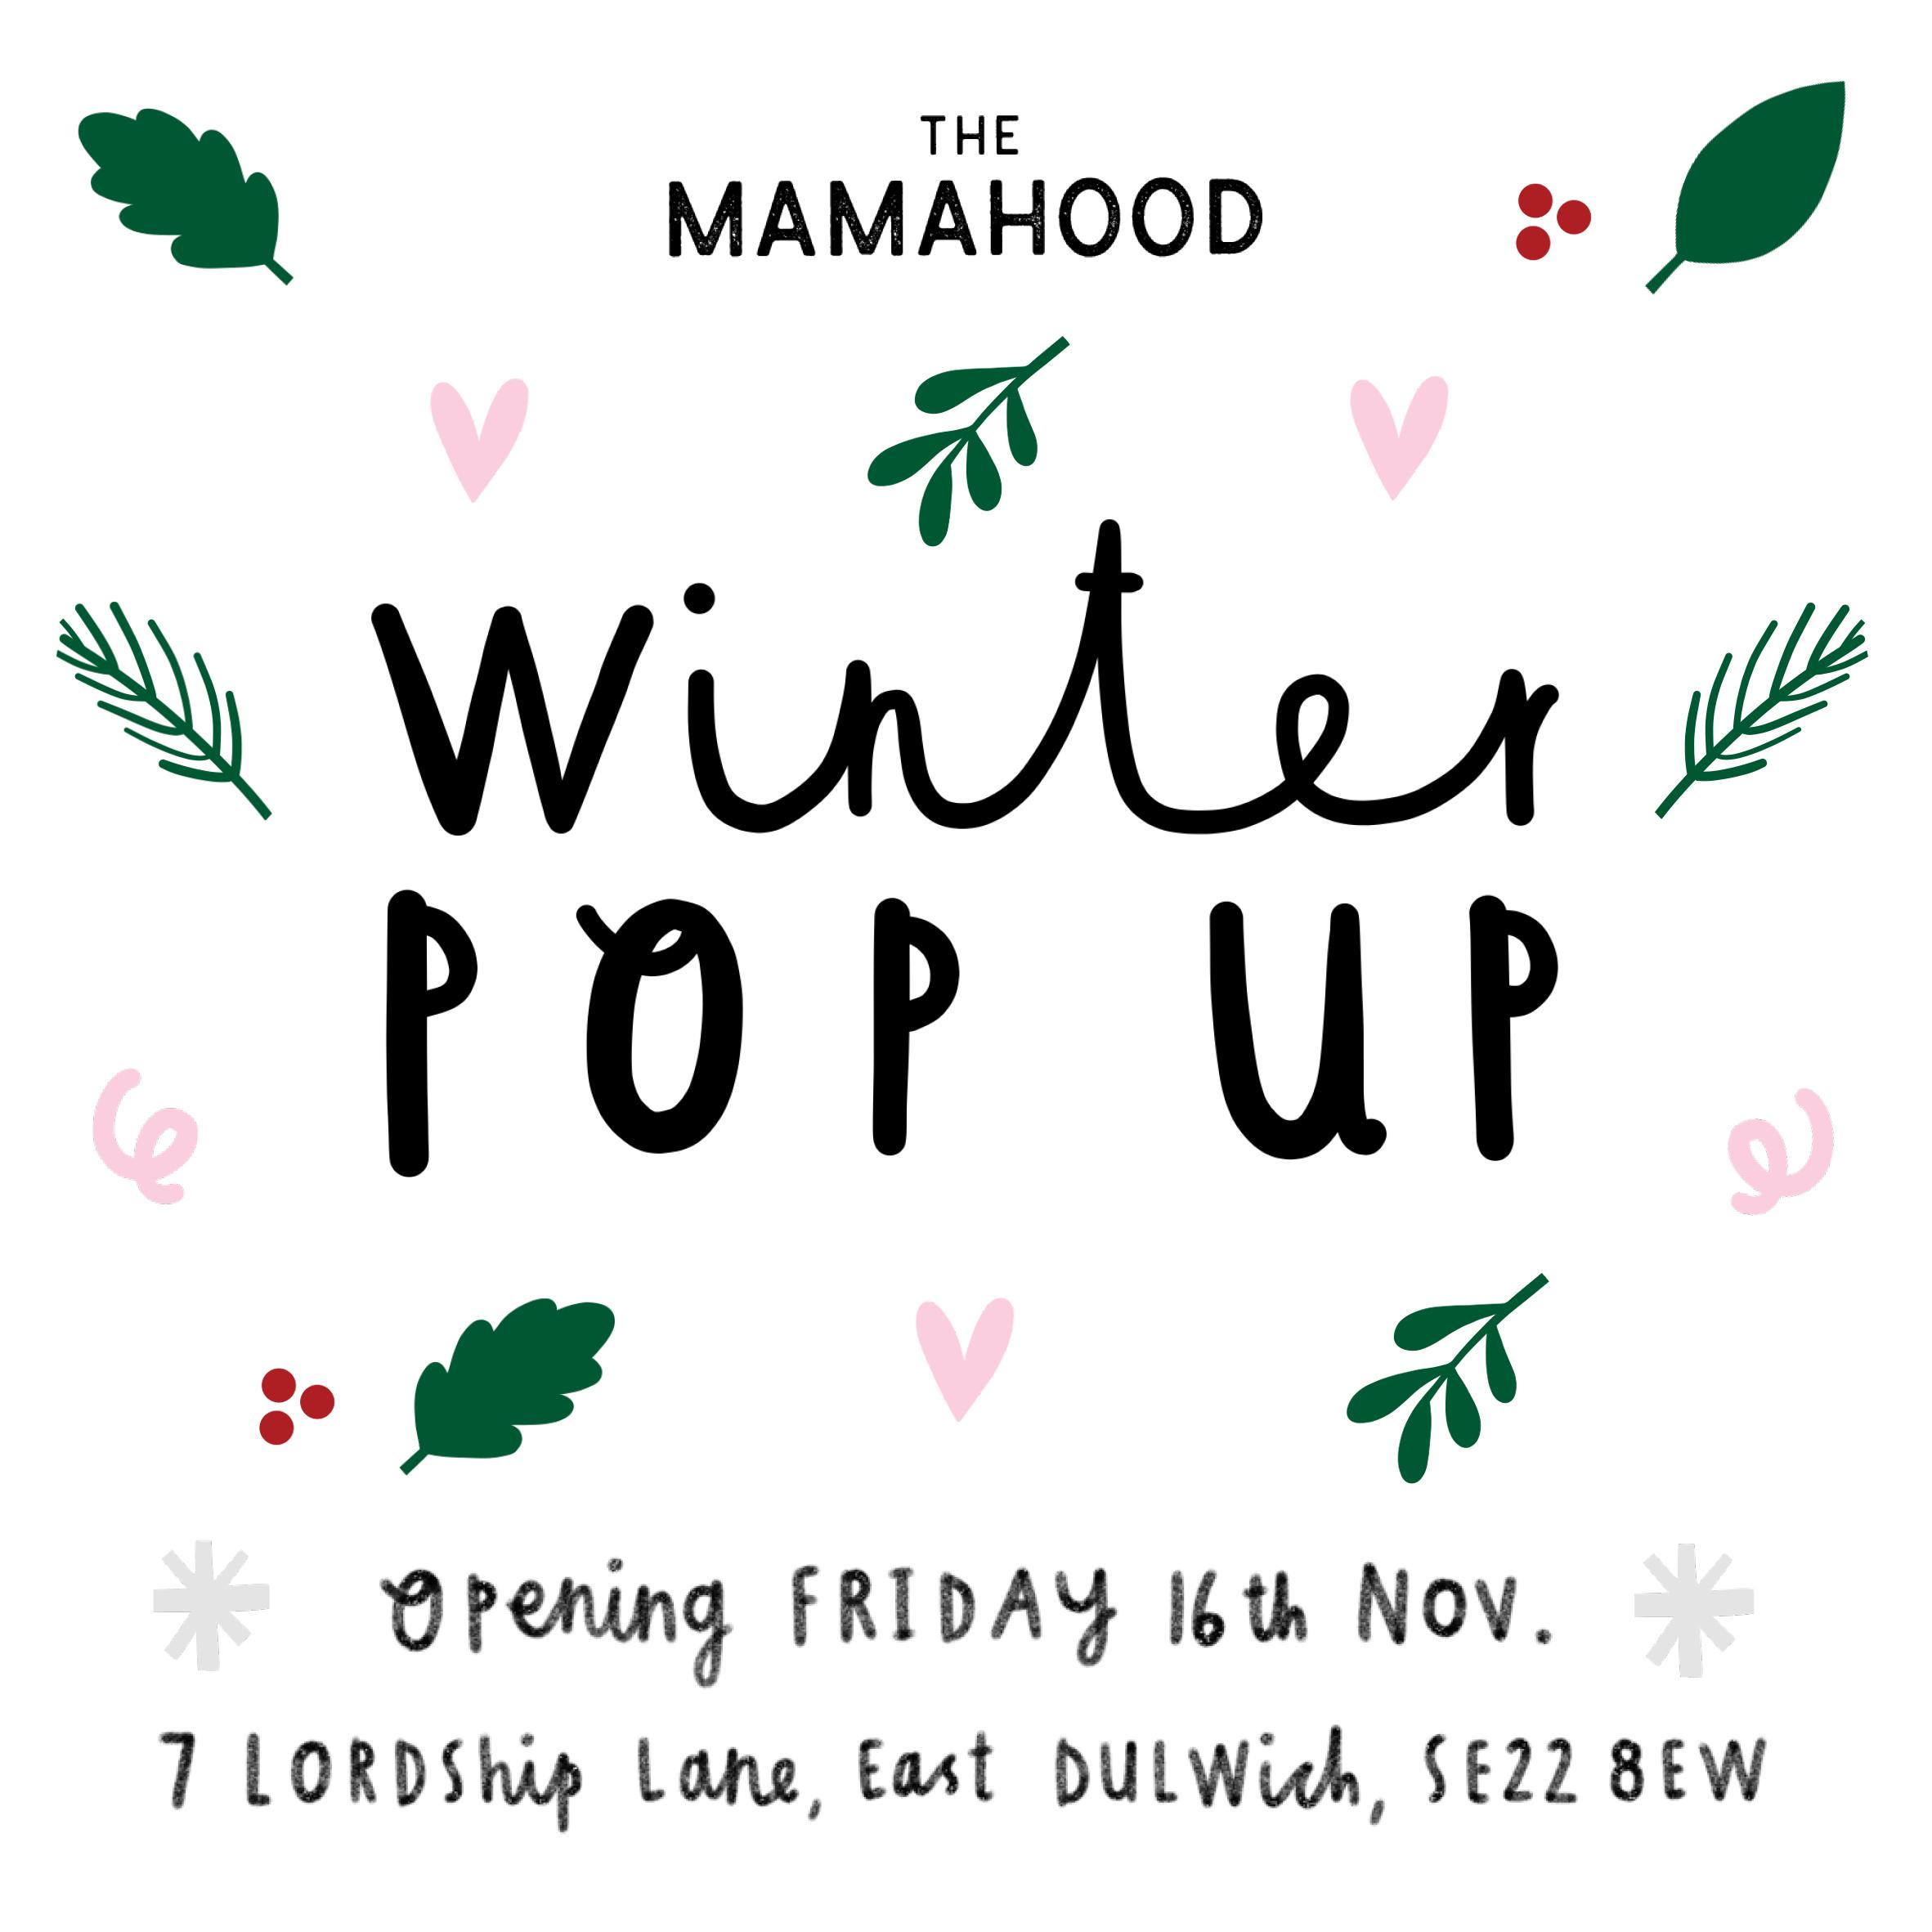 Mamahood Winter Popup Flyer.jpg